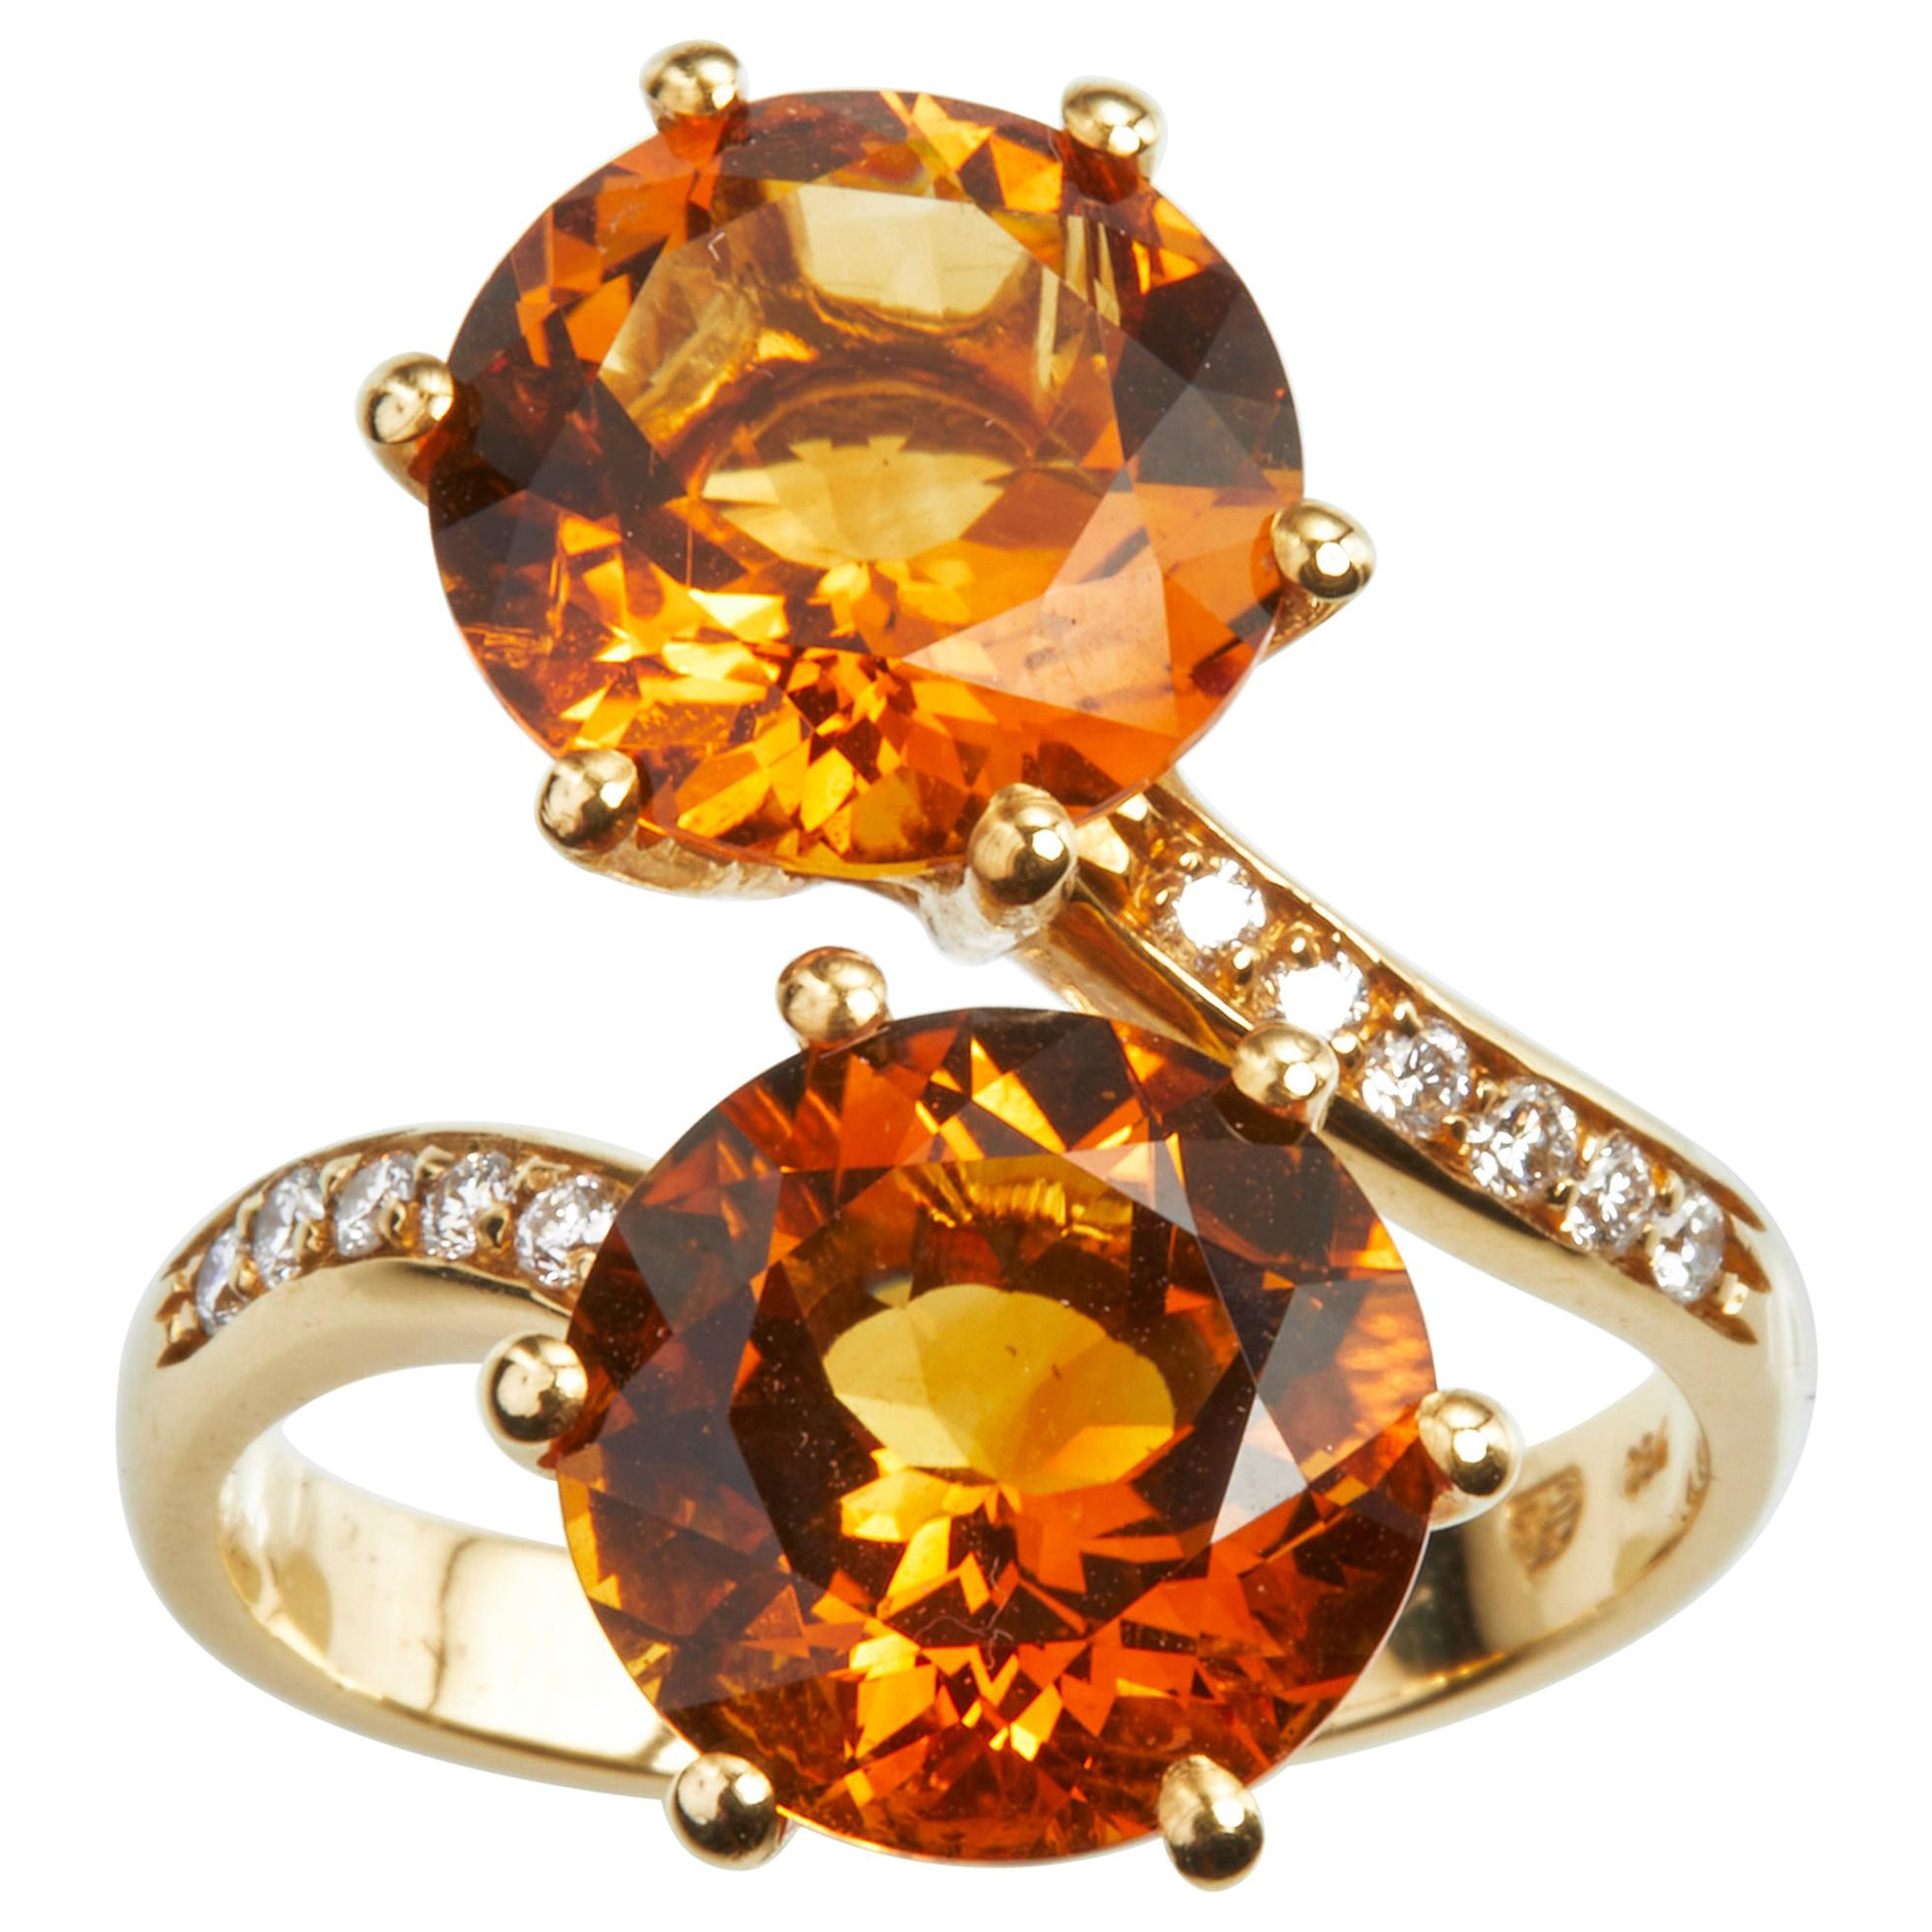 18 Karat Yellow Gold Diamond and Citrine Cocktail Ring